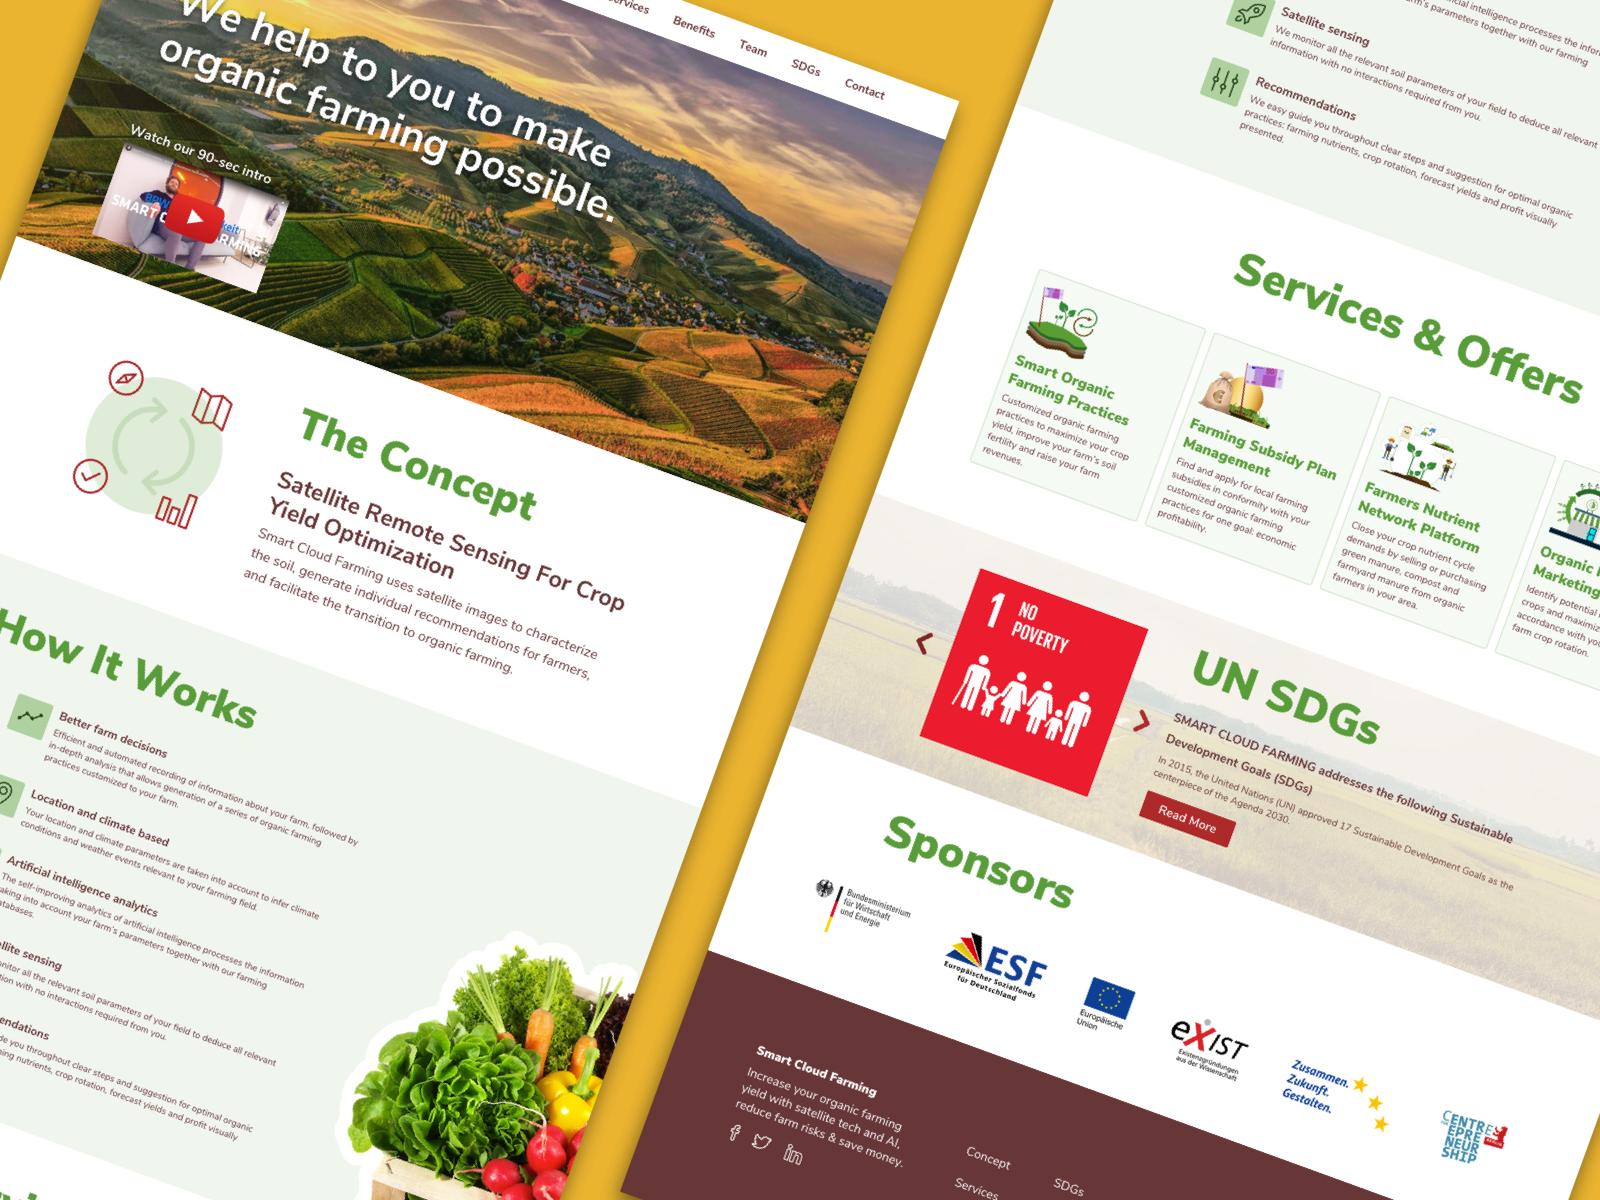 Claude ayitey smart cloud farming concept website redesign